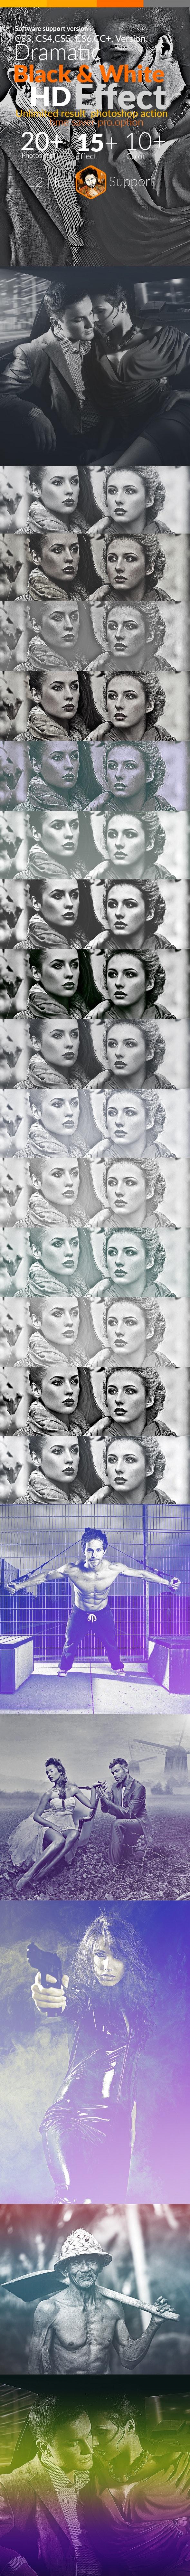 Dramatic Black & White Effect - Actions Photoshop